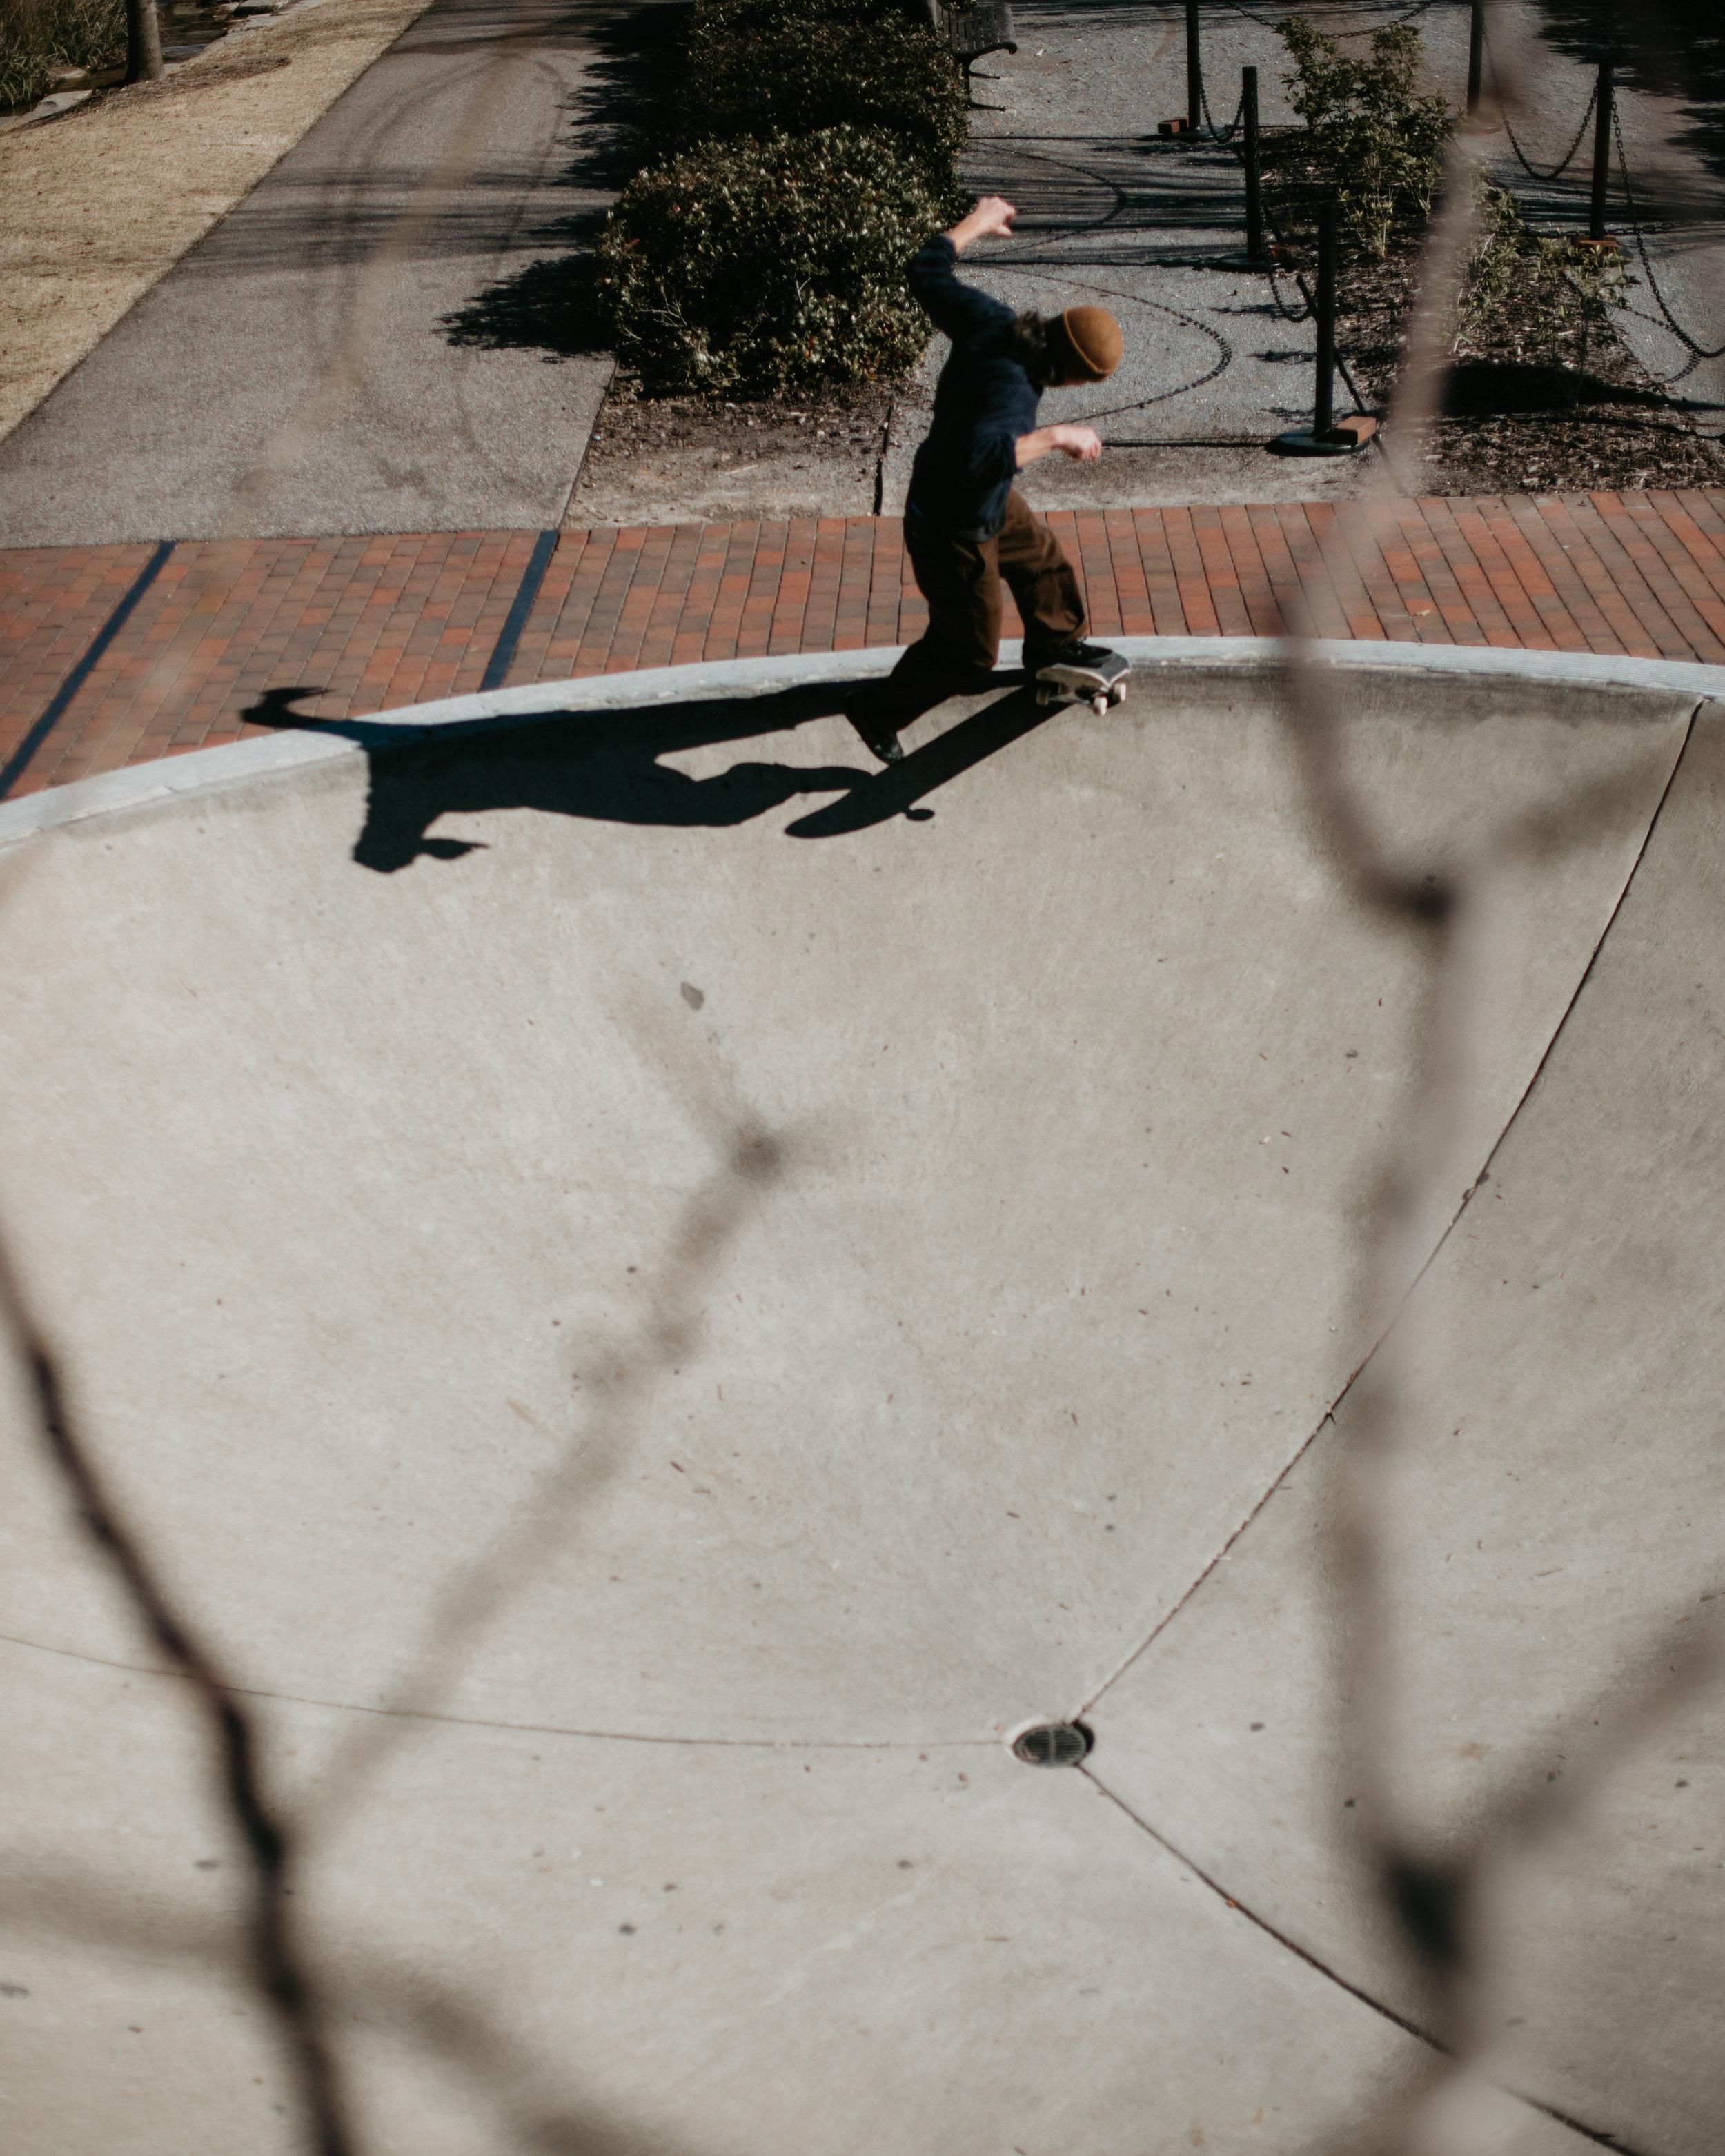 Matt Boeltel, no comply frontside tailslide. Birmingham, AL.